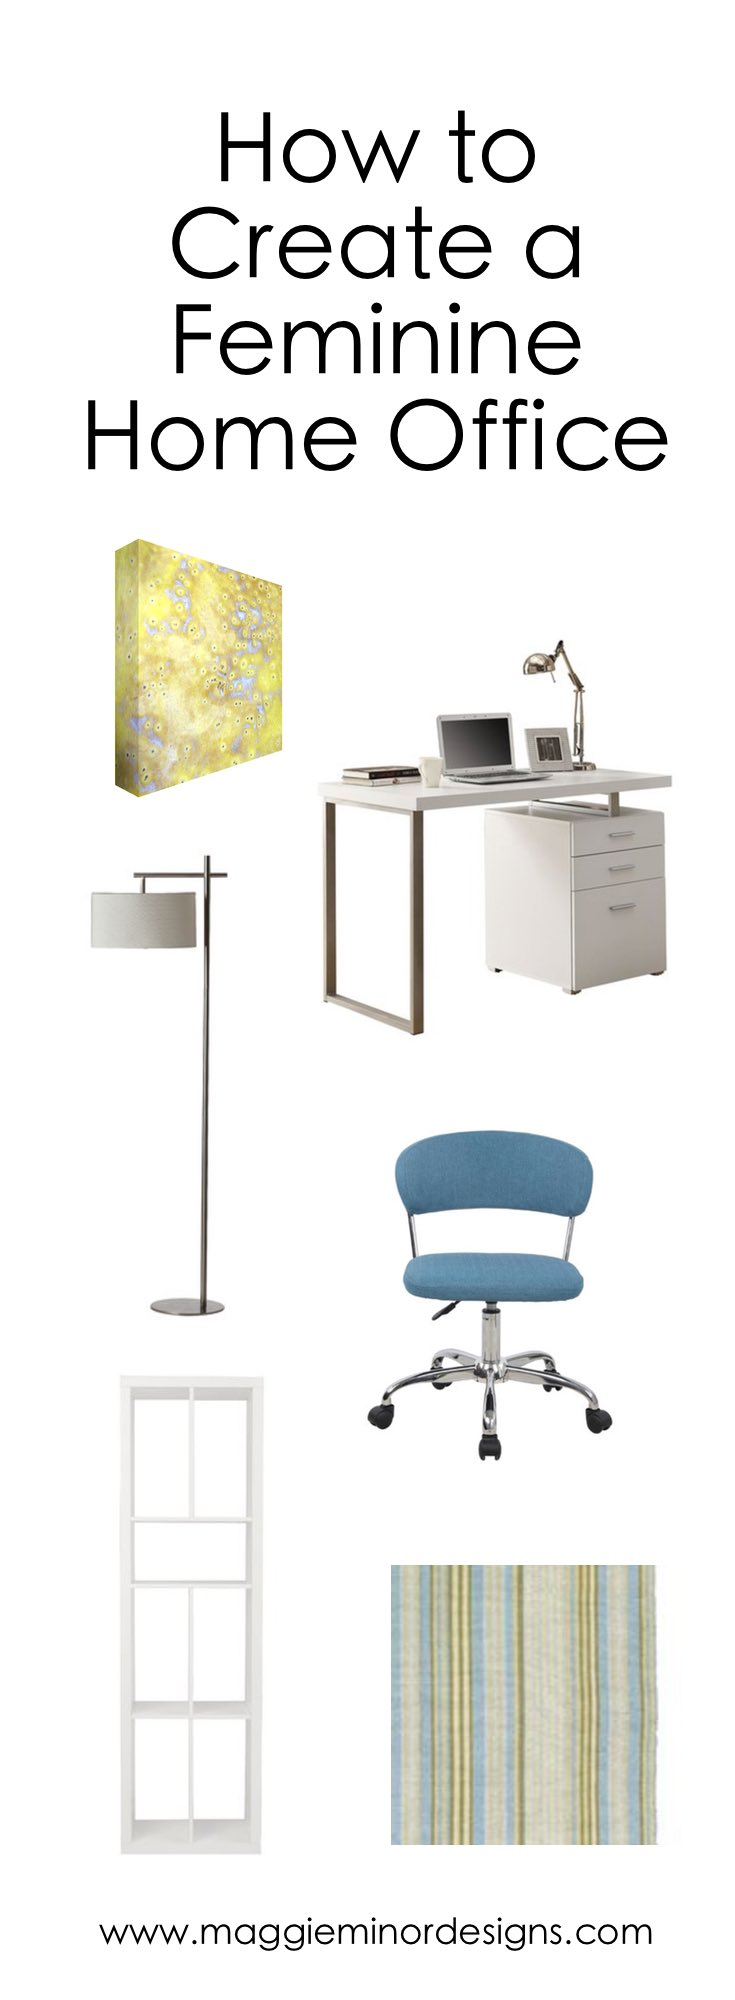 How to Create a Feminine Home Office